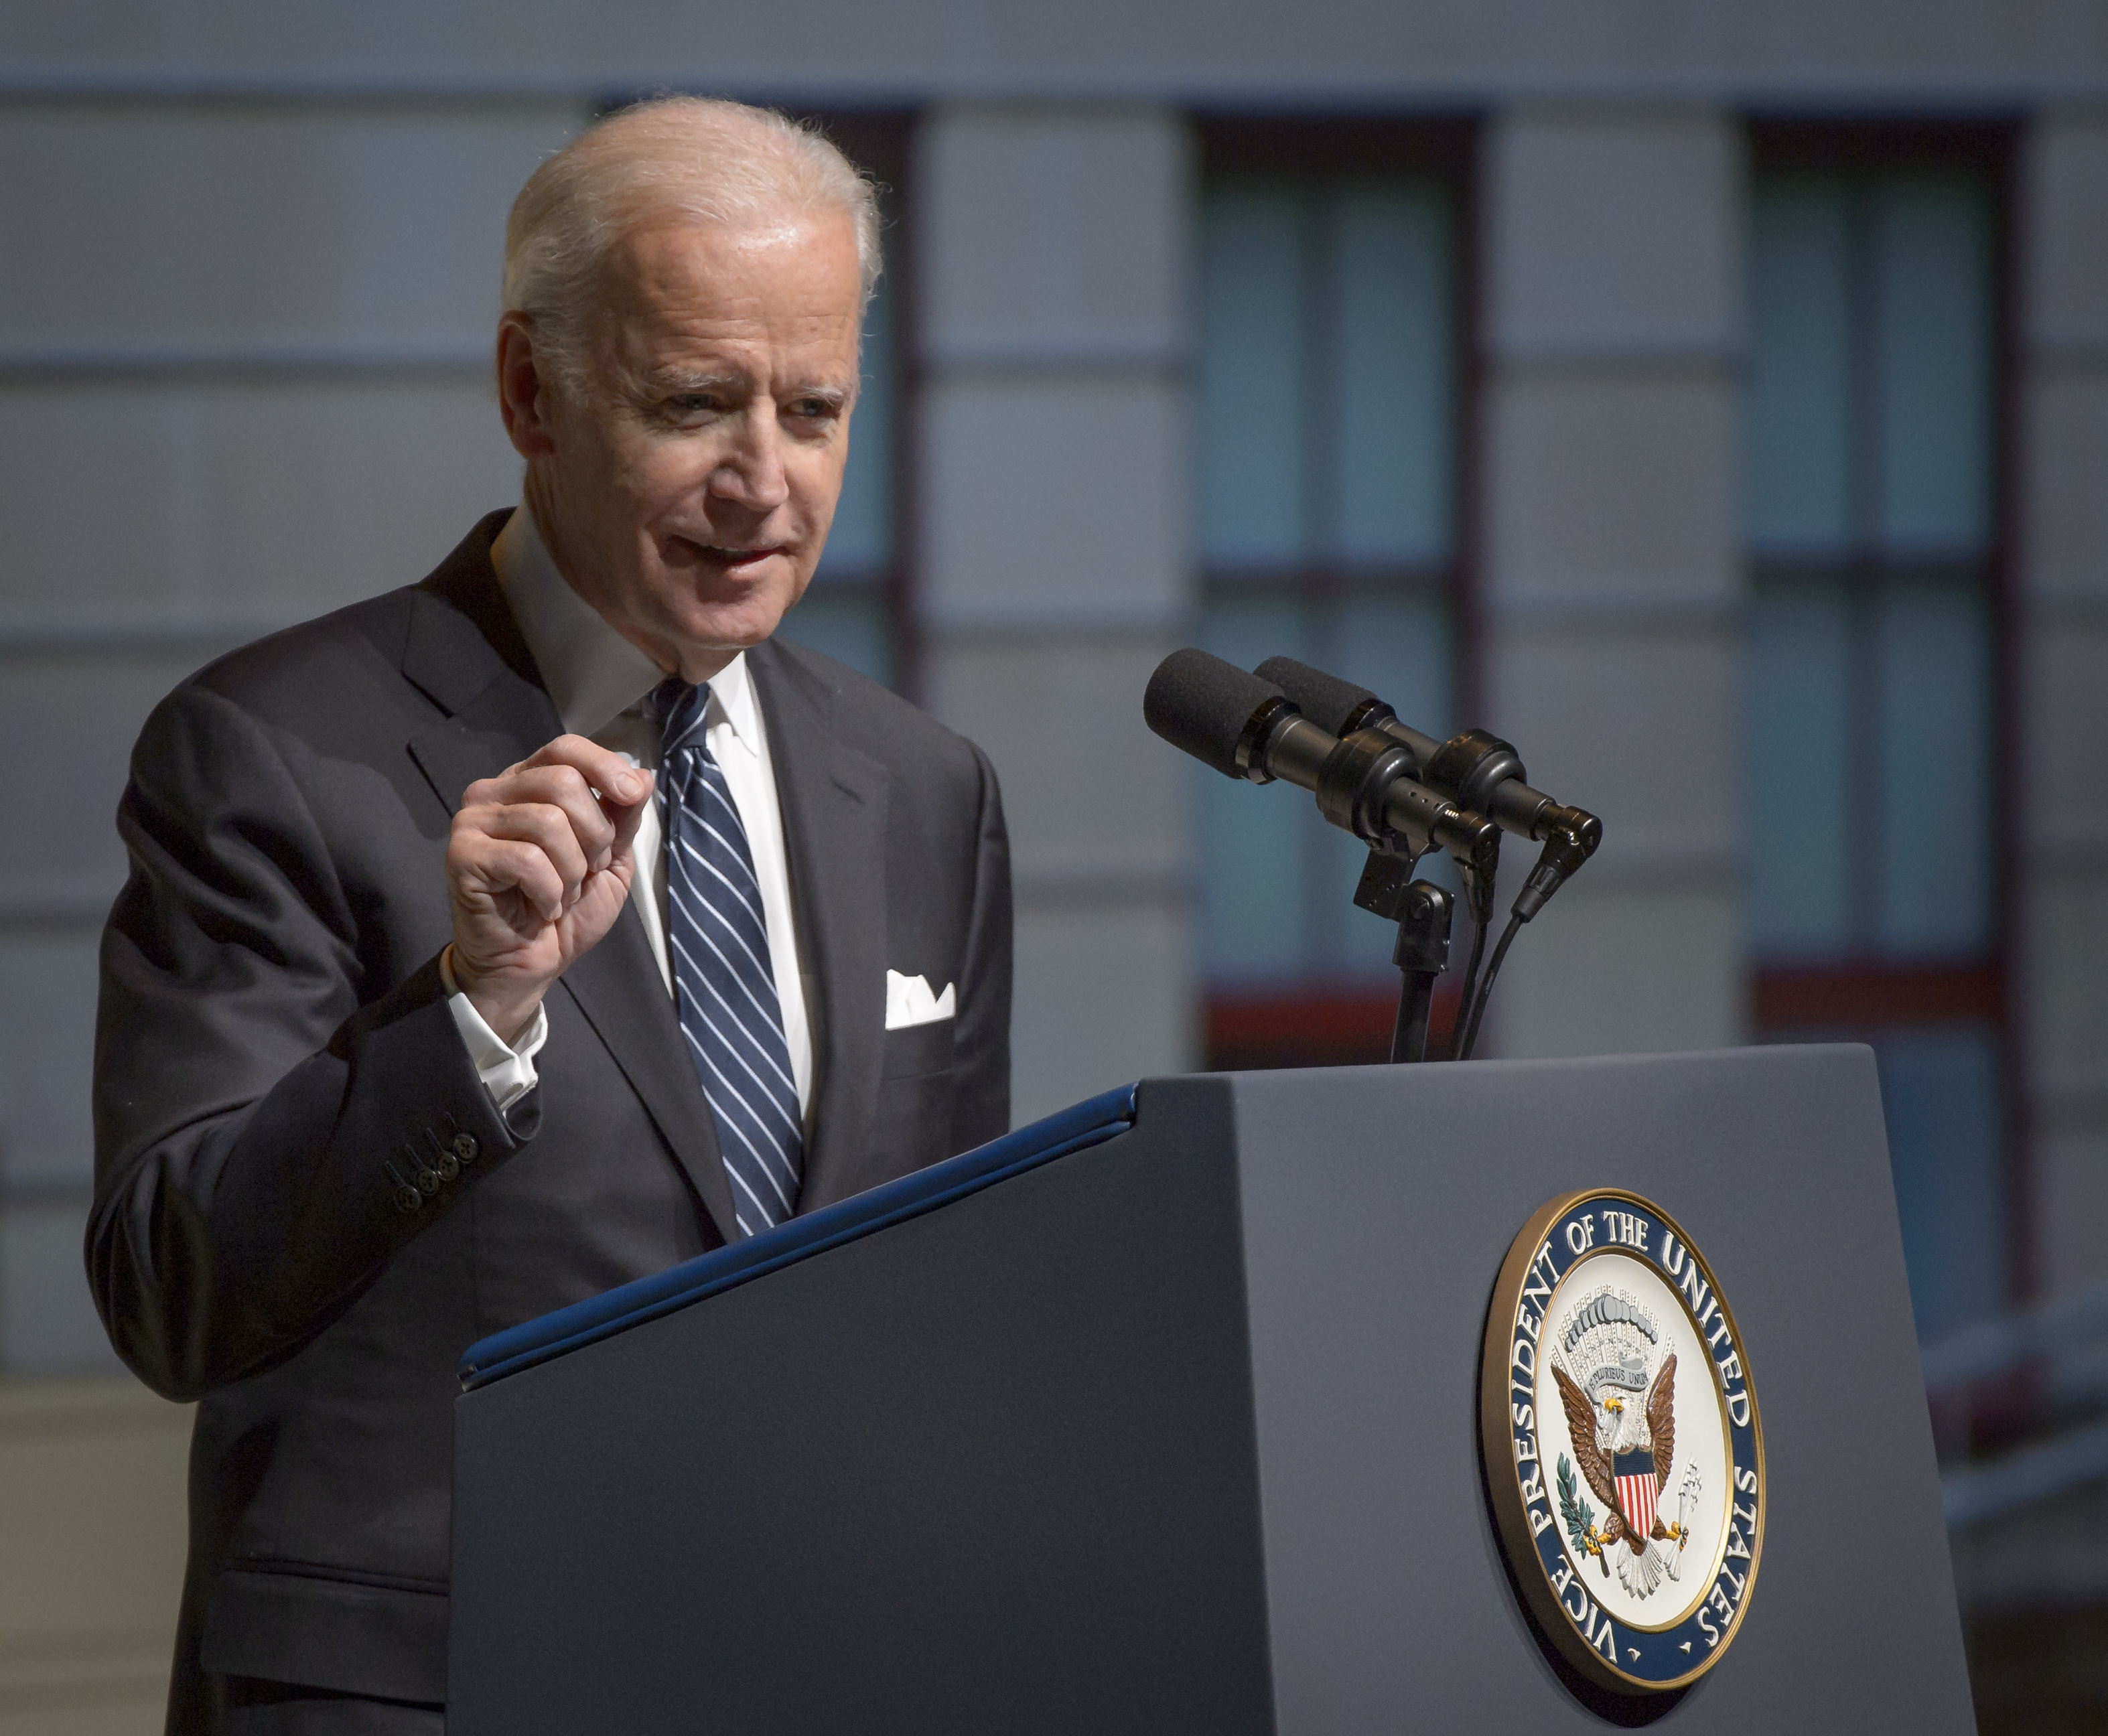 Vice President Joe Biden speaks during a service celebrating the life of former astronaut and U.S. Senator John Glenn on Dec. 17, 2016 in Columbus, Ohio.